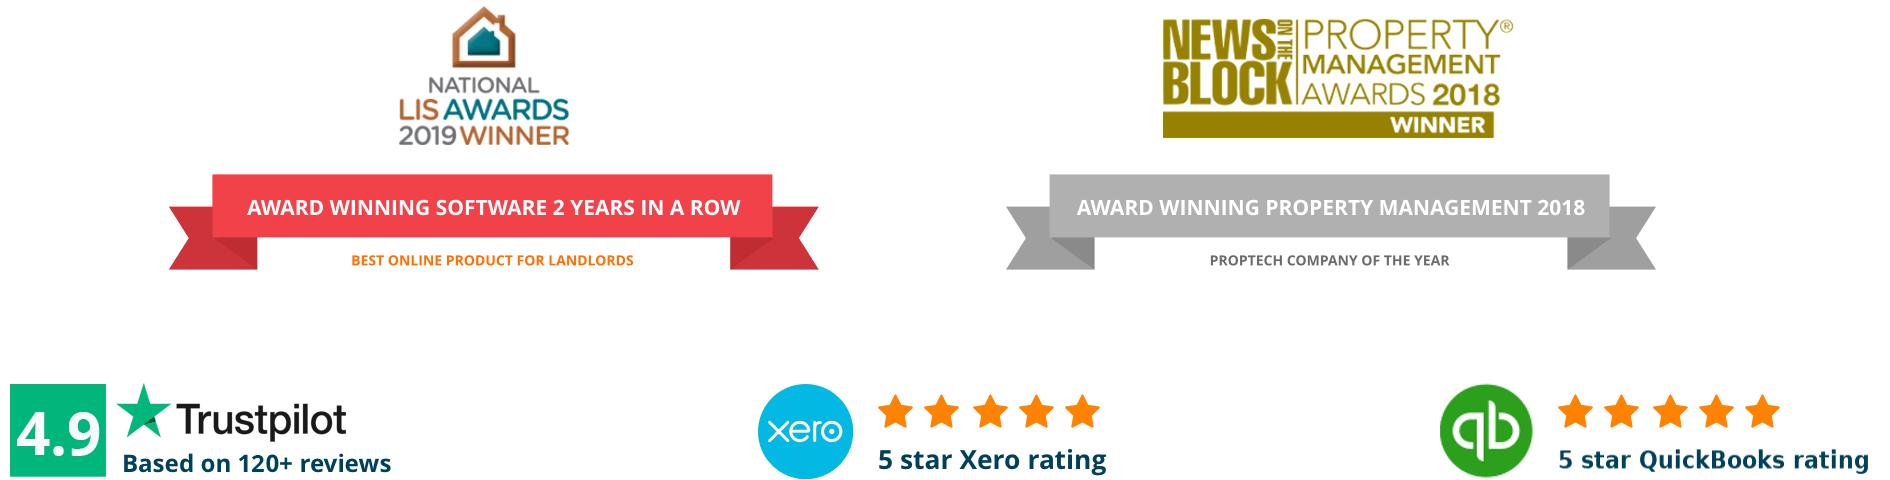 Trustpilot, Property management awards, Xero & Quickbooks